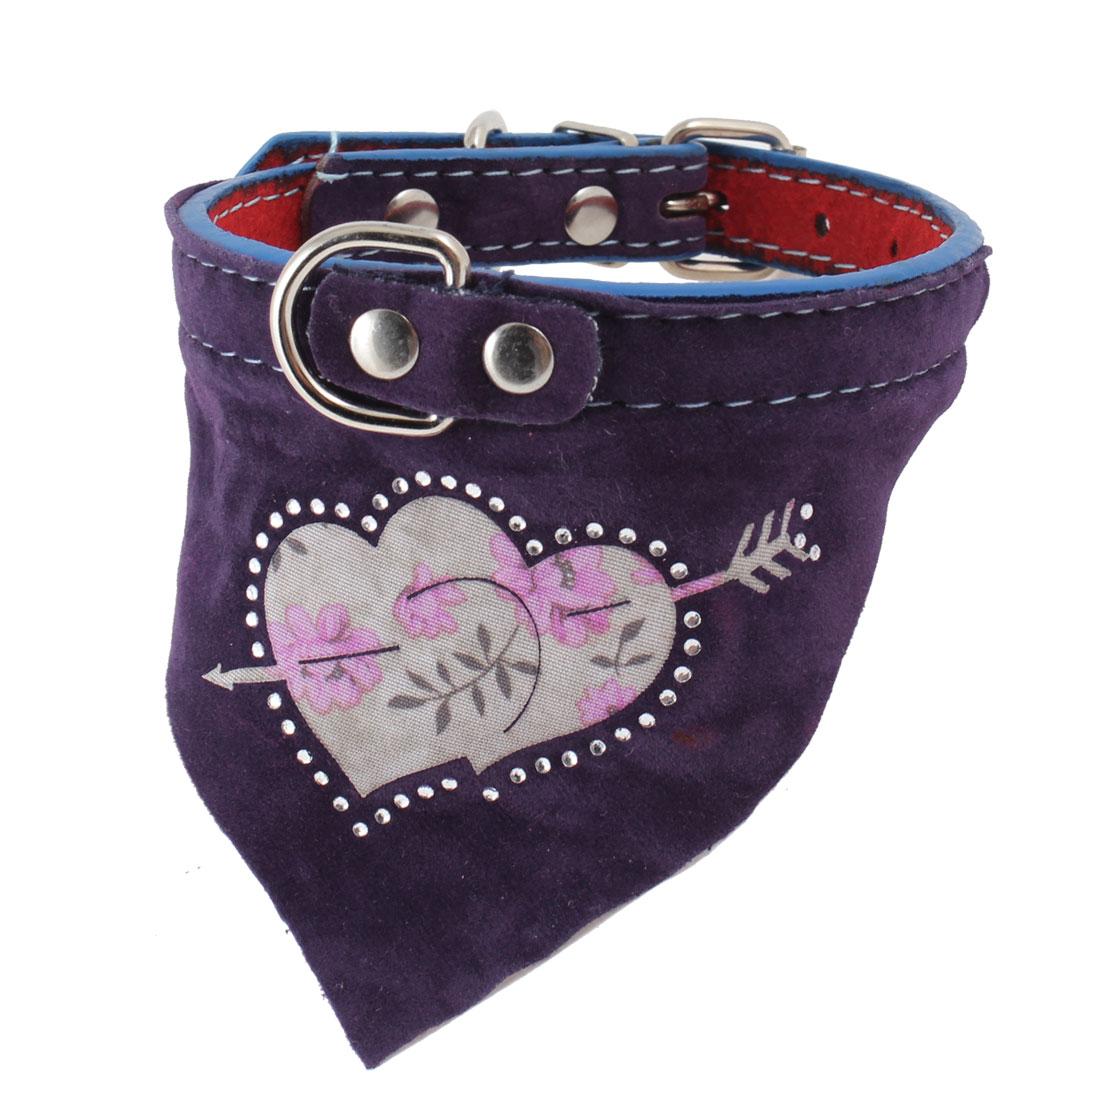 Single Pin Buckle Floral Pattern Adjustable Bandana Collar Purple for Pet Dog